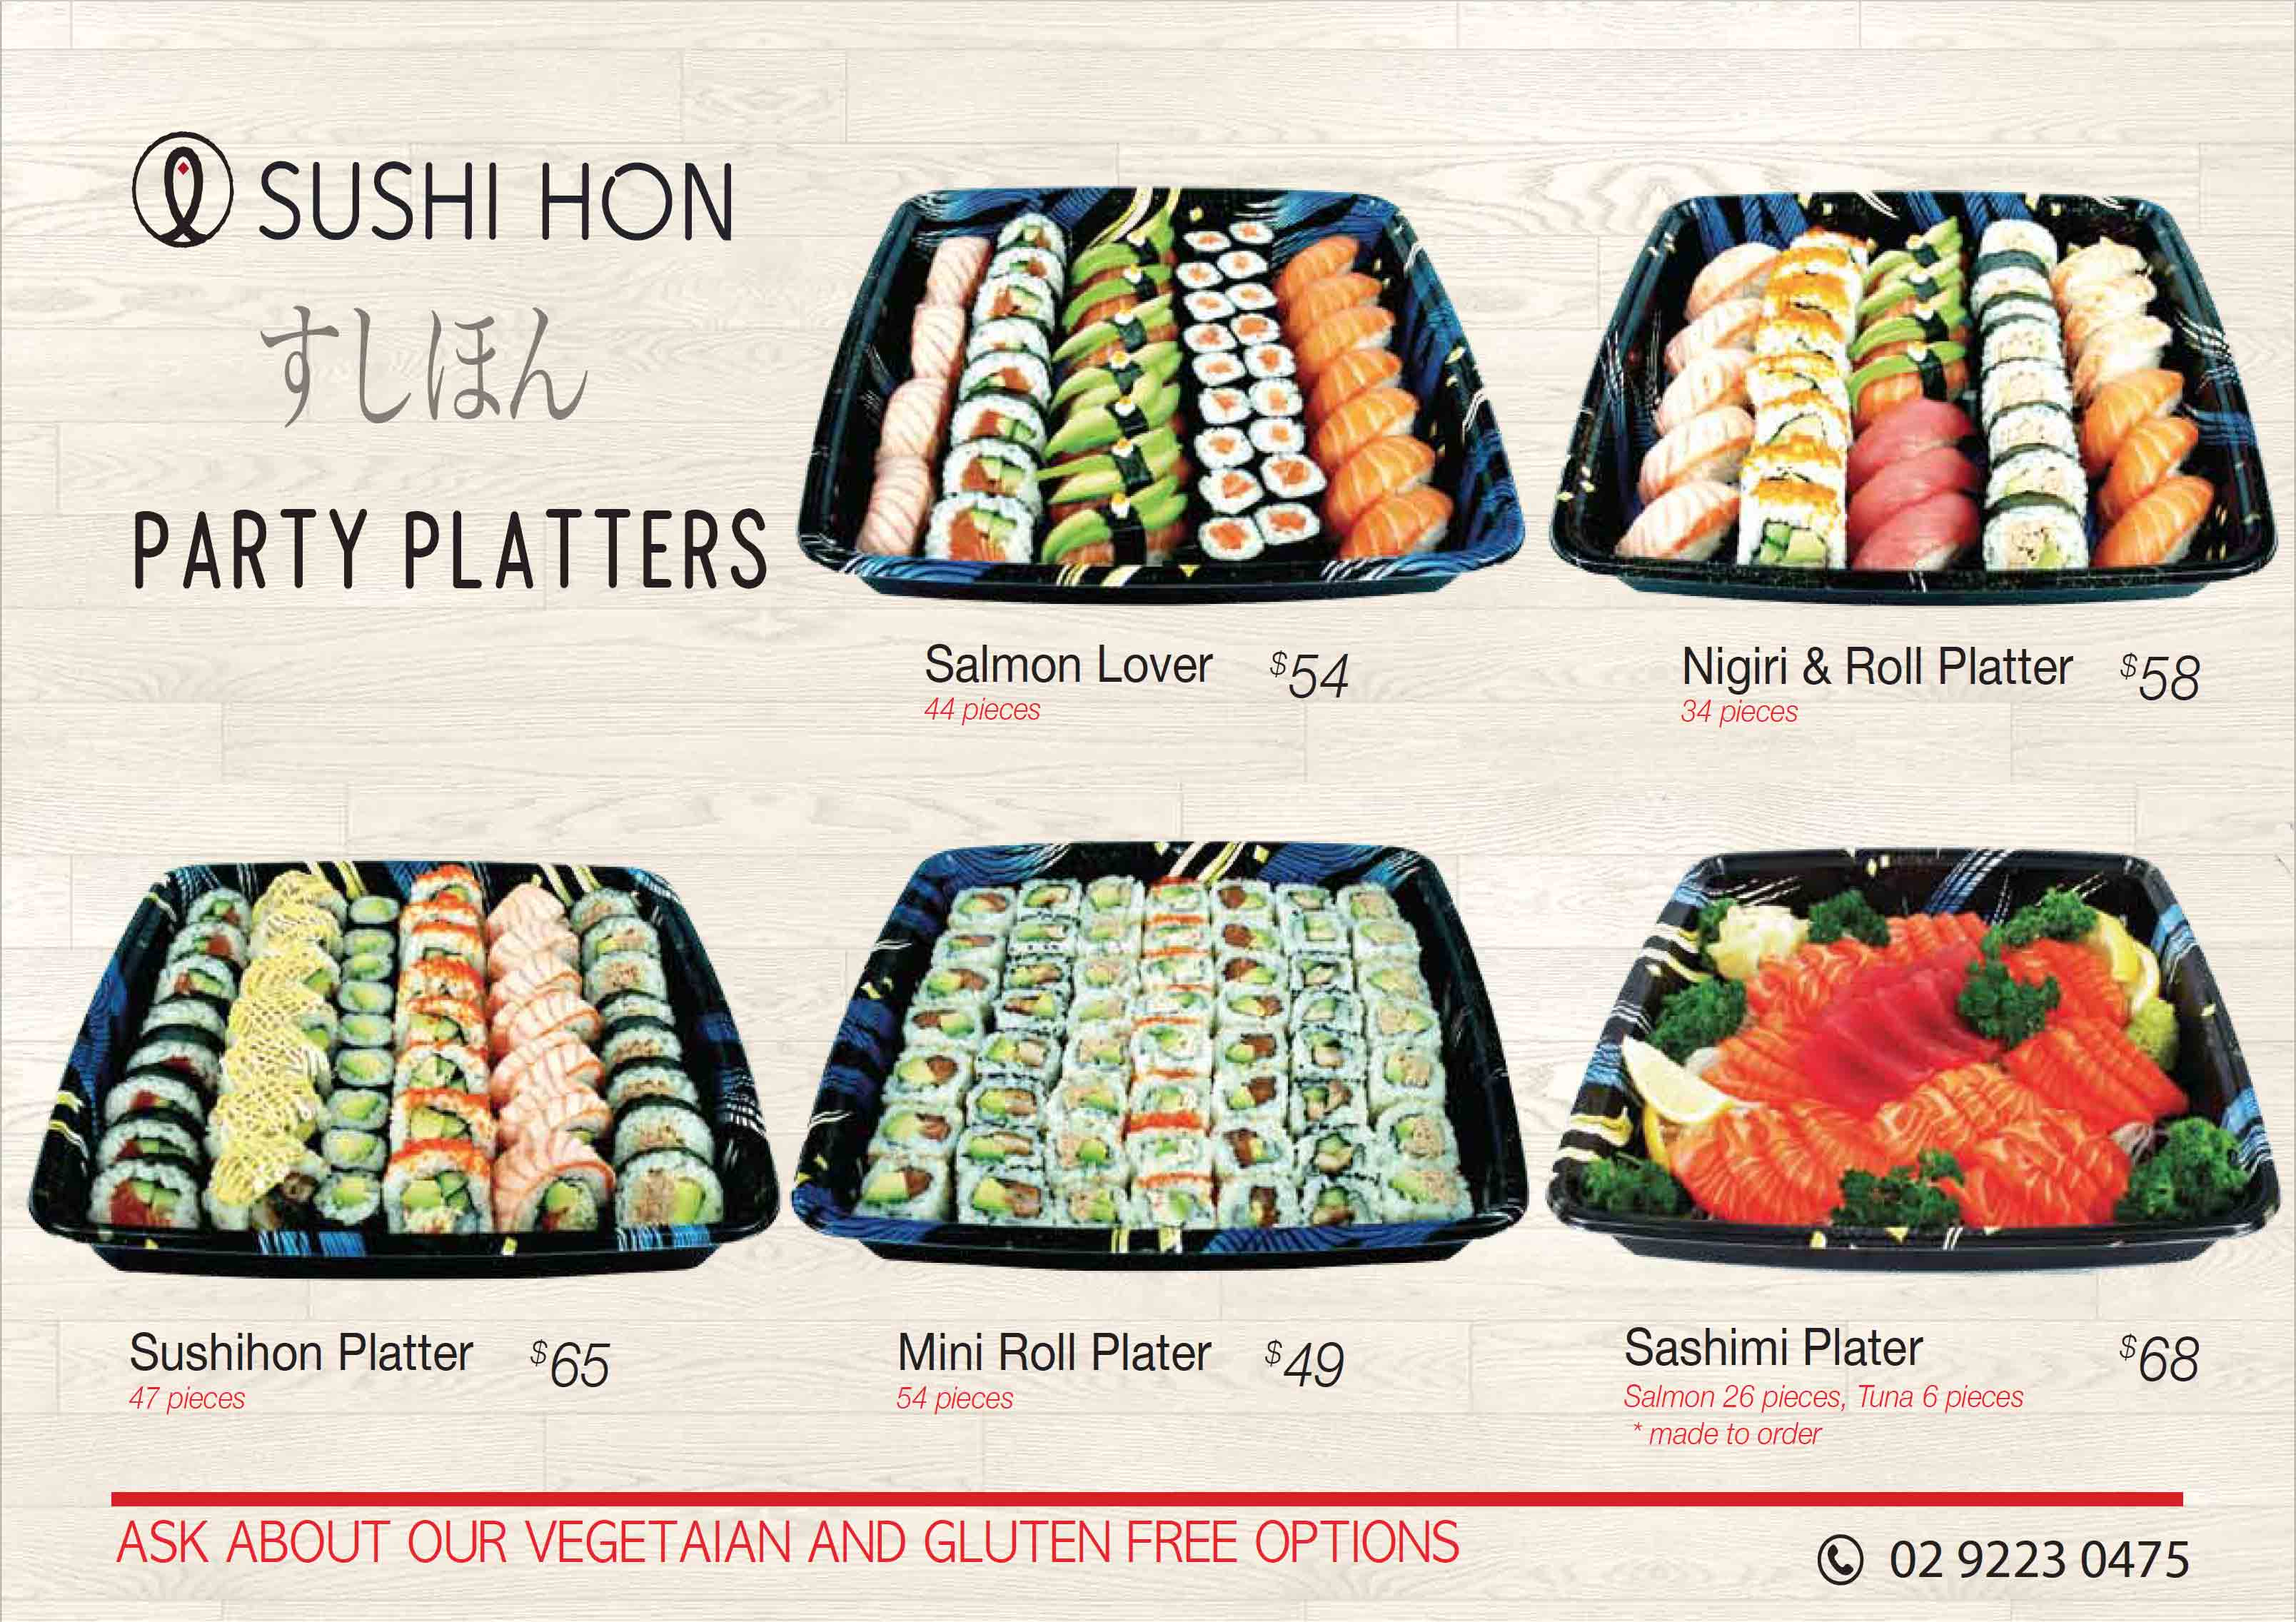 http://sushihon.com.au/wp-content/uploads/2016/06/catering.pdf